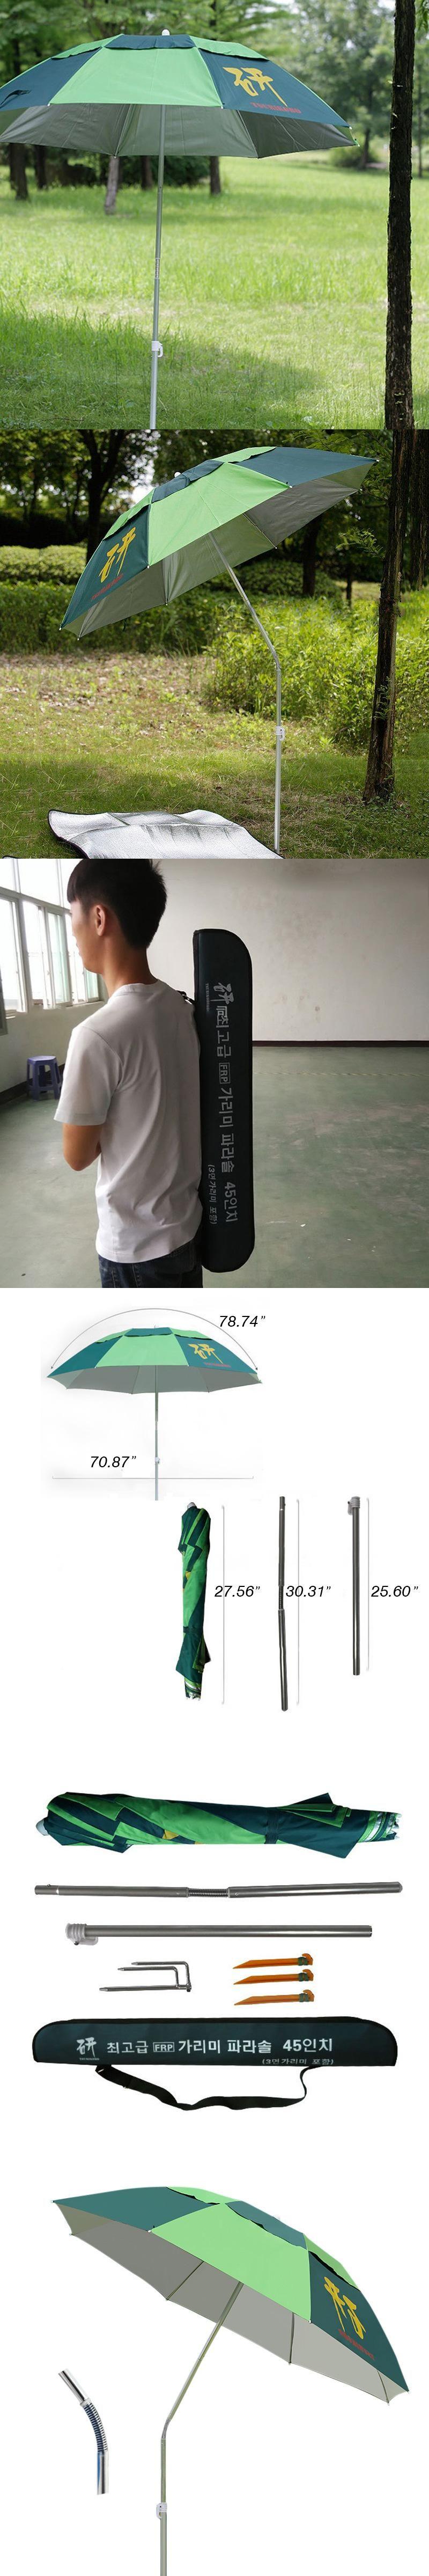 Patio Furniture Lightweight Patio Umbrellas Windproof Garden Umbrella  Three Folding Sunshade Rainproof Fishing Umbrella